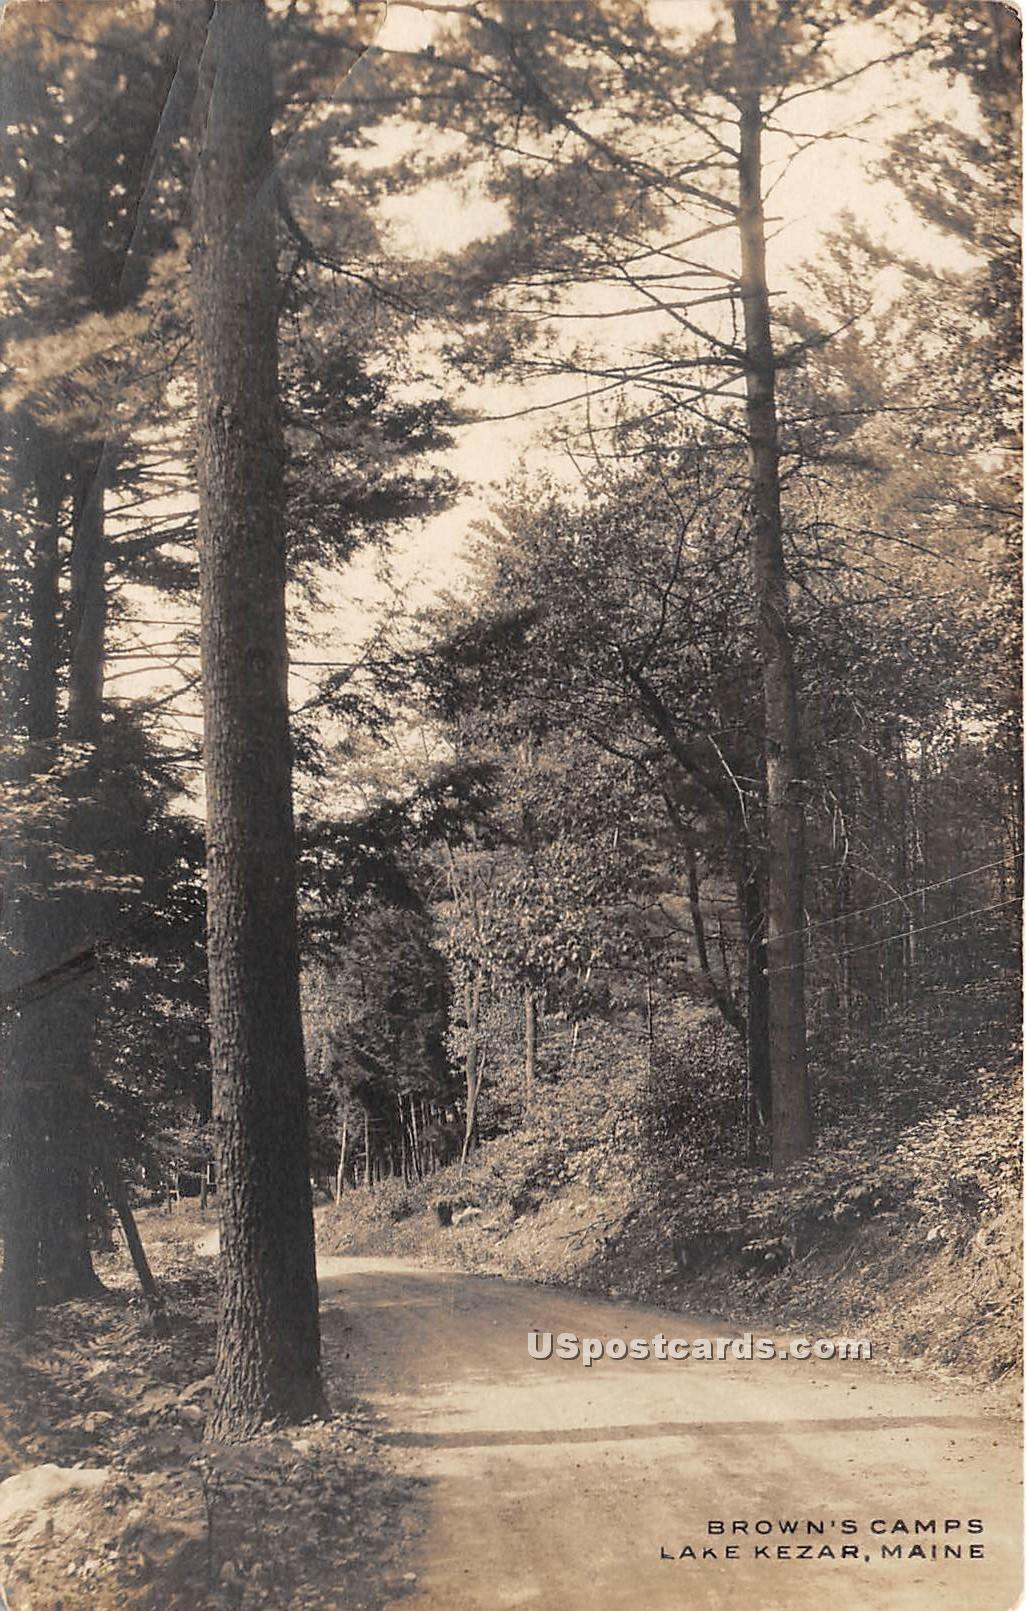 Brown's Camps - Lake Kezar, Maine ME Postcard